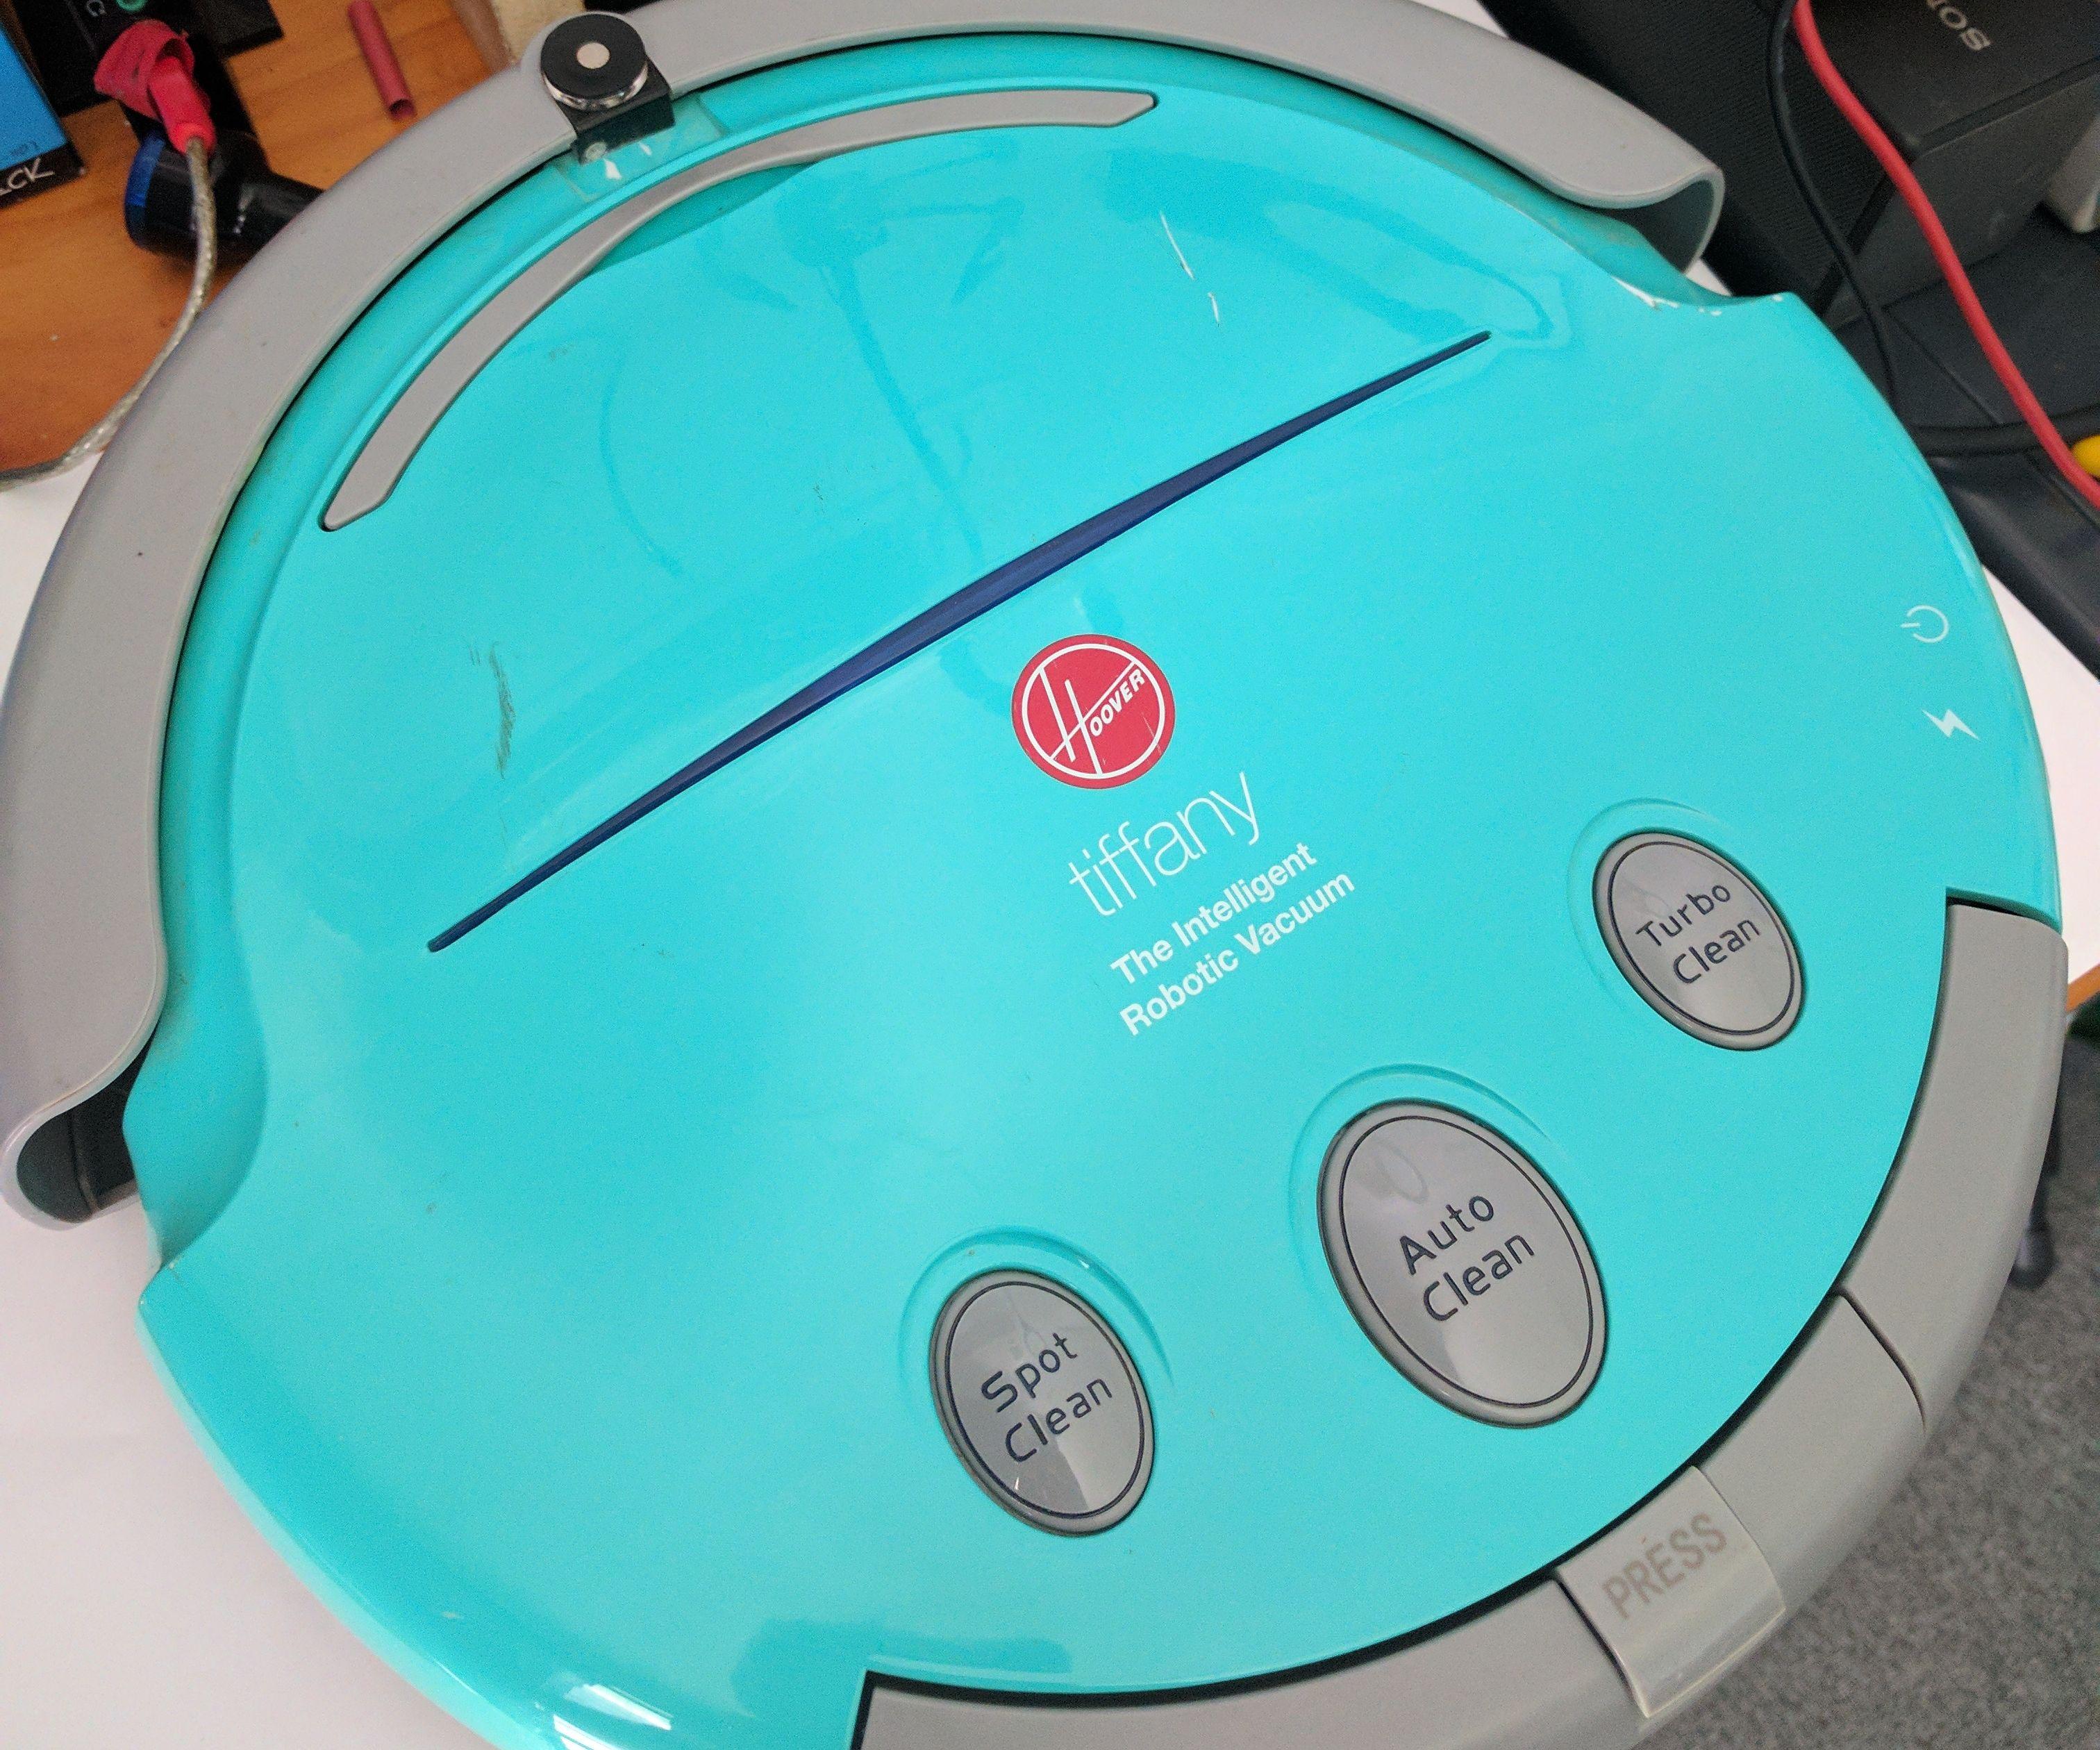 Hoover Tiffany (5240) Robot Vac Lithium Battery Upgrade